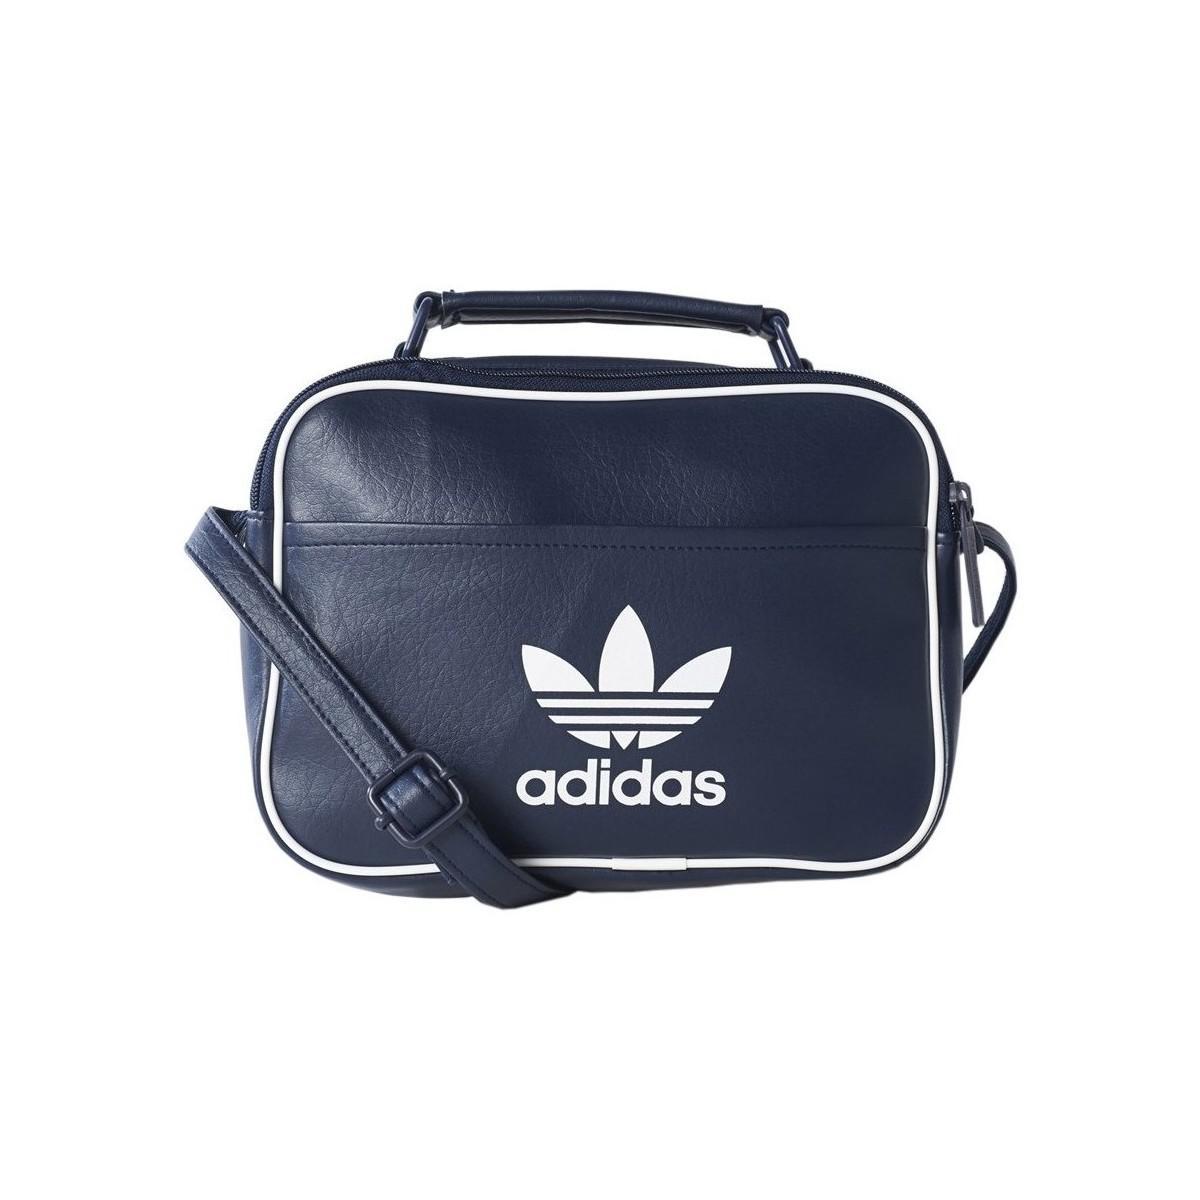 219b05c04e Adidas Originals Airliner Classic Bag Mini Women s Messenger Bag In ...